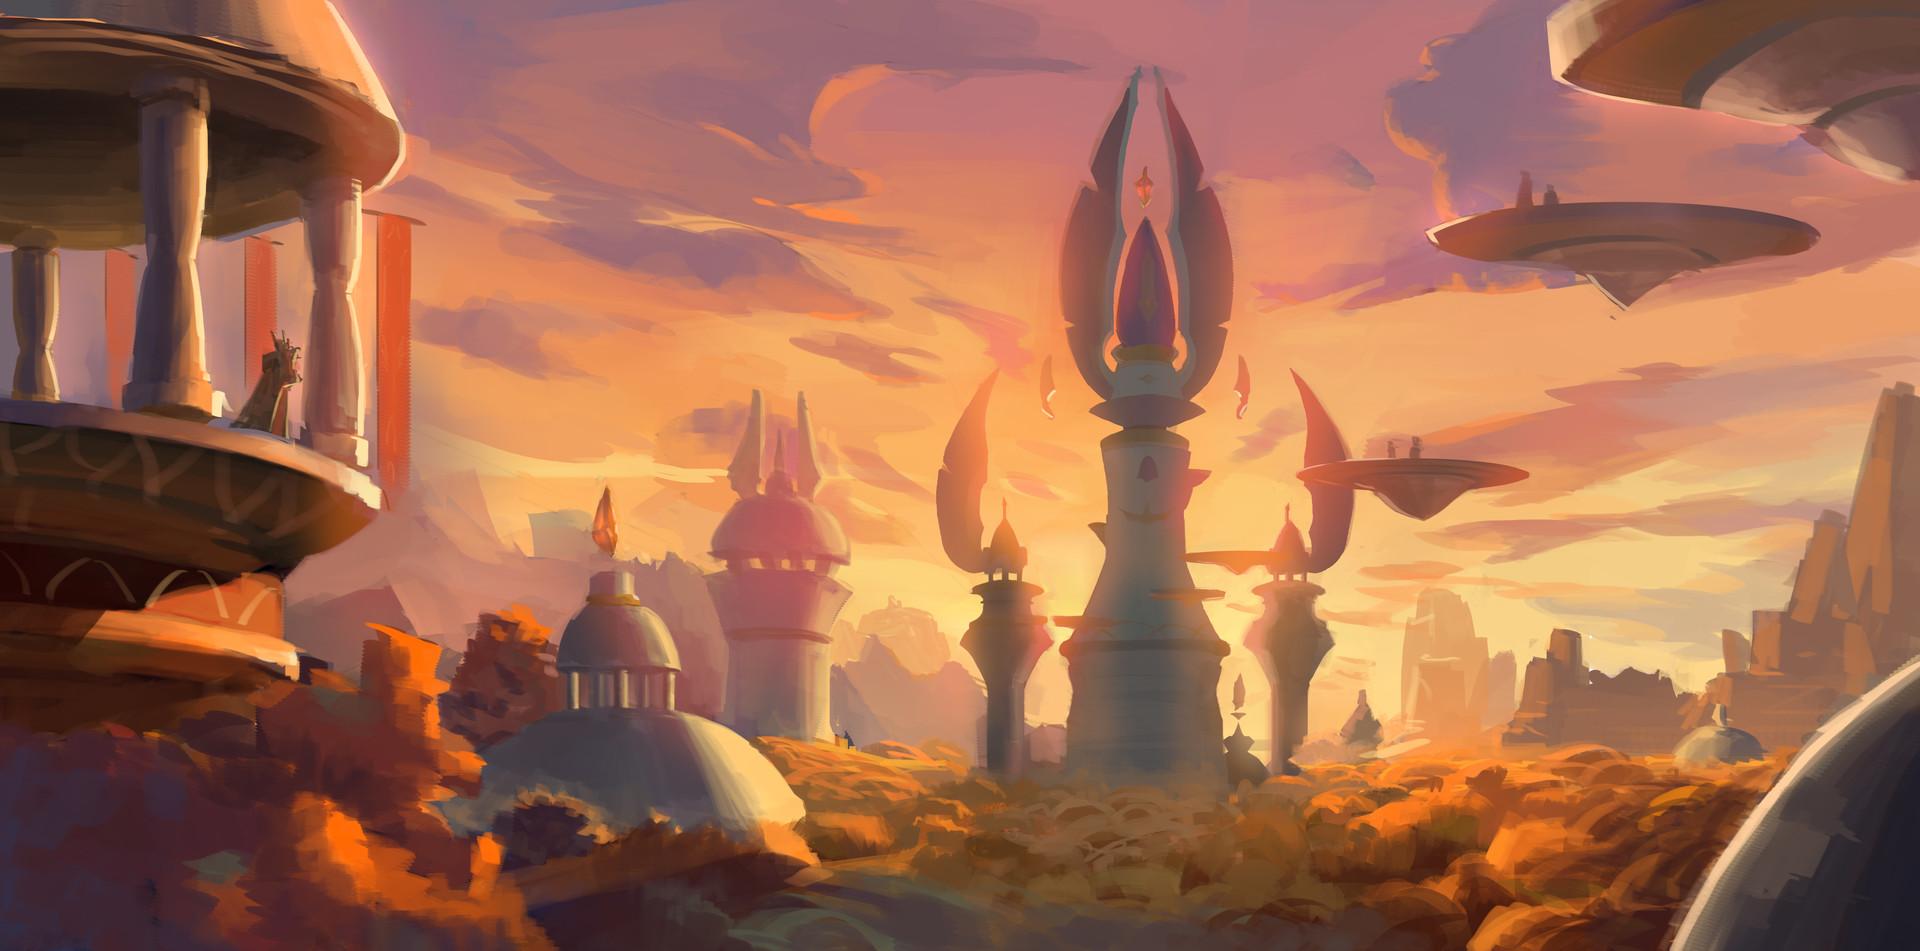 robin-hang-silvermoon-city.jpg?149322353